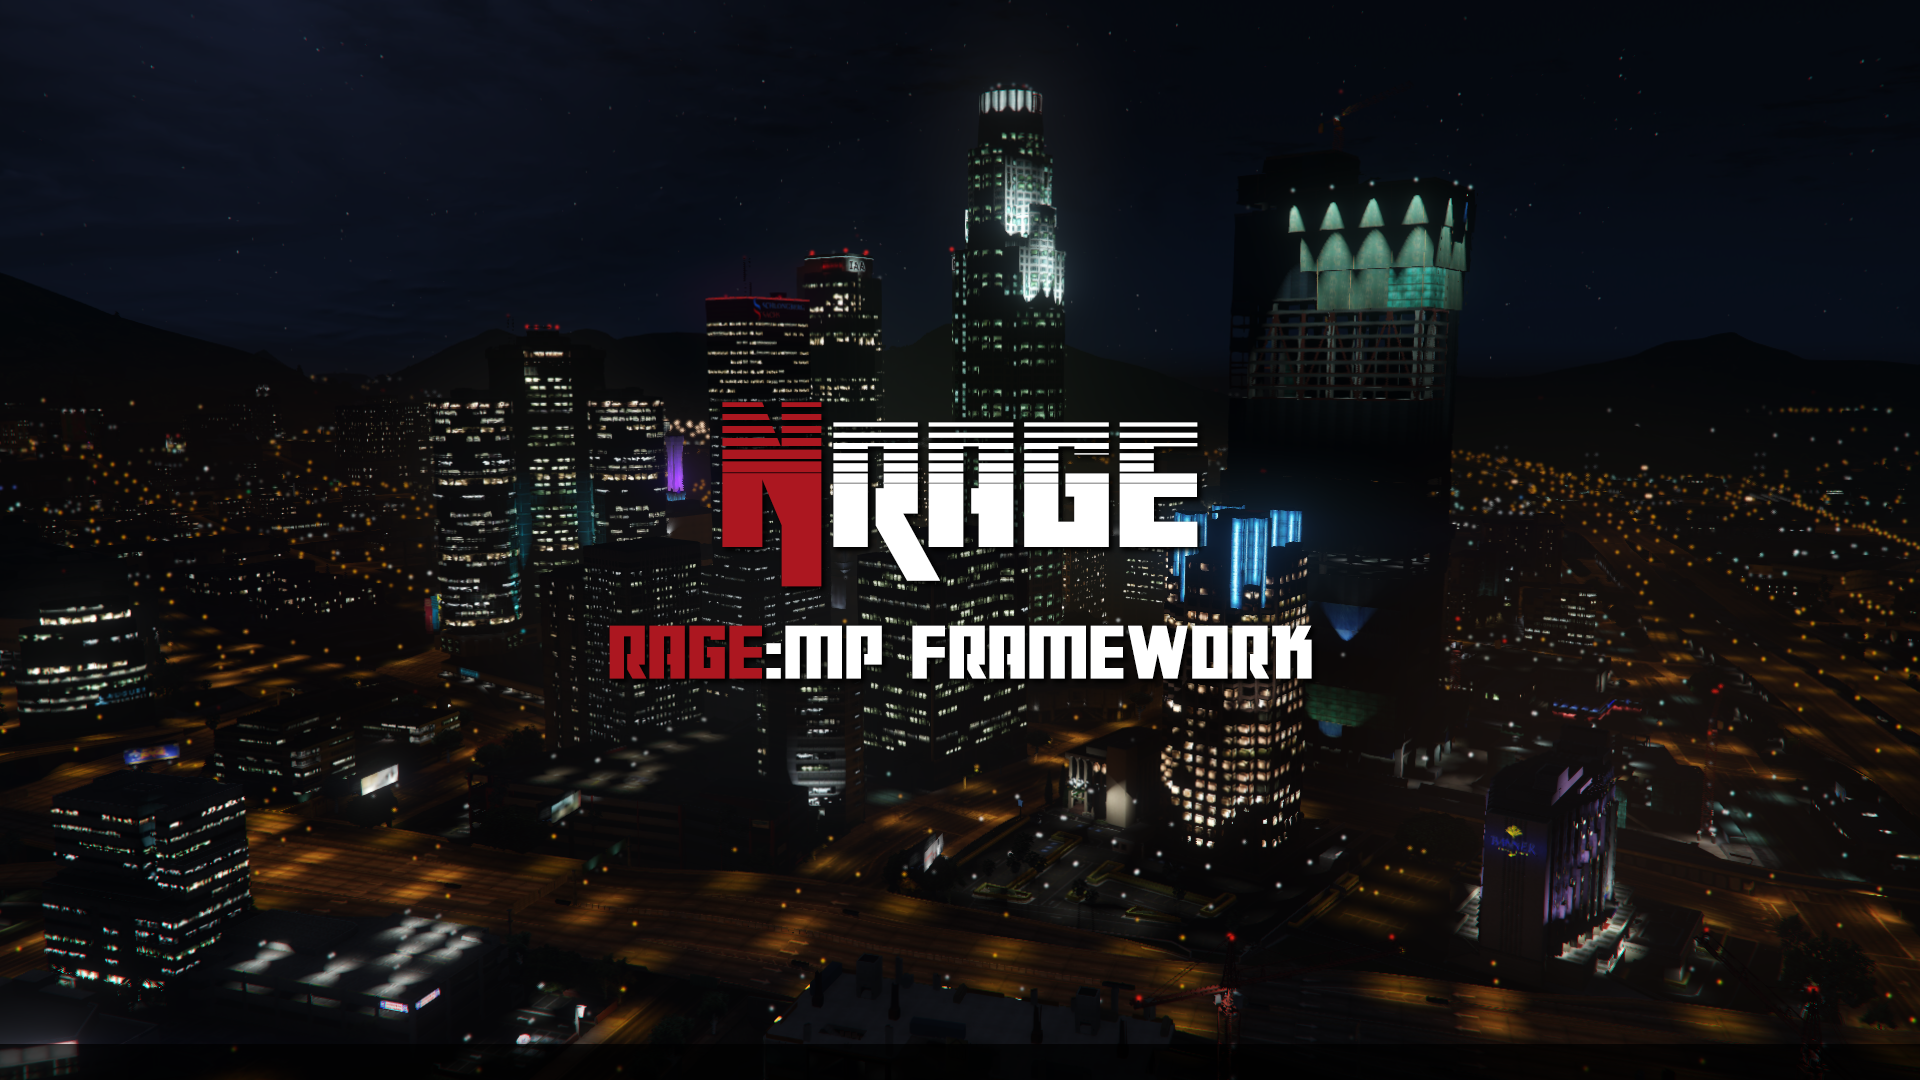 NRage Framework (RAGE:MP)